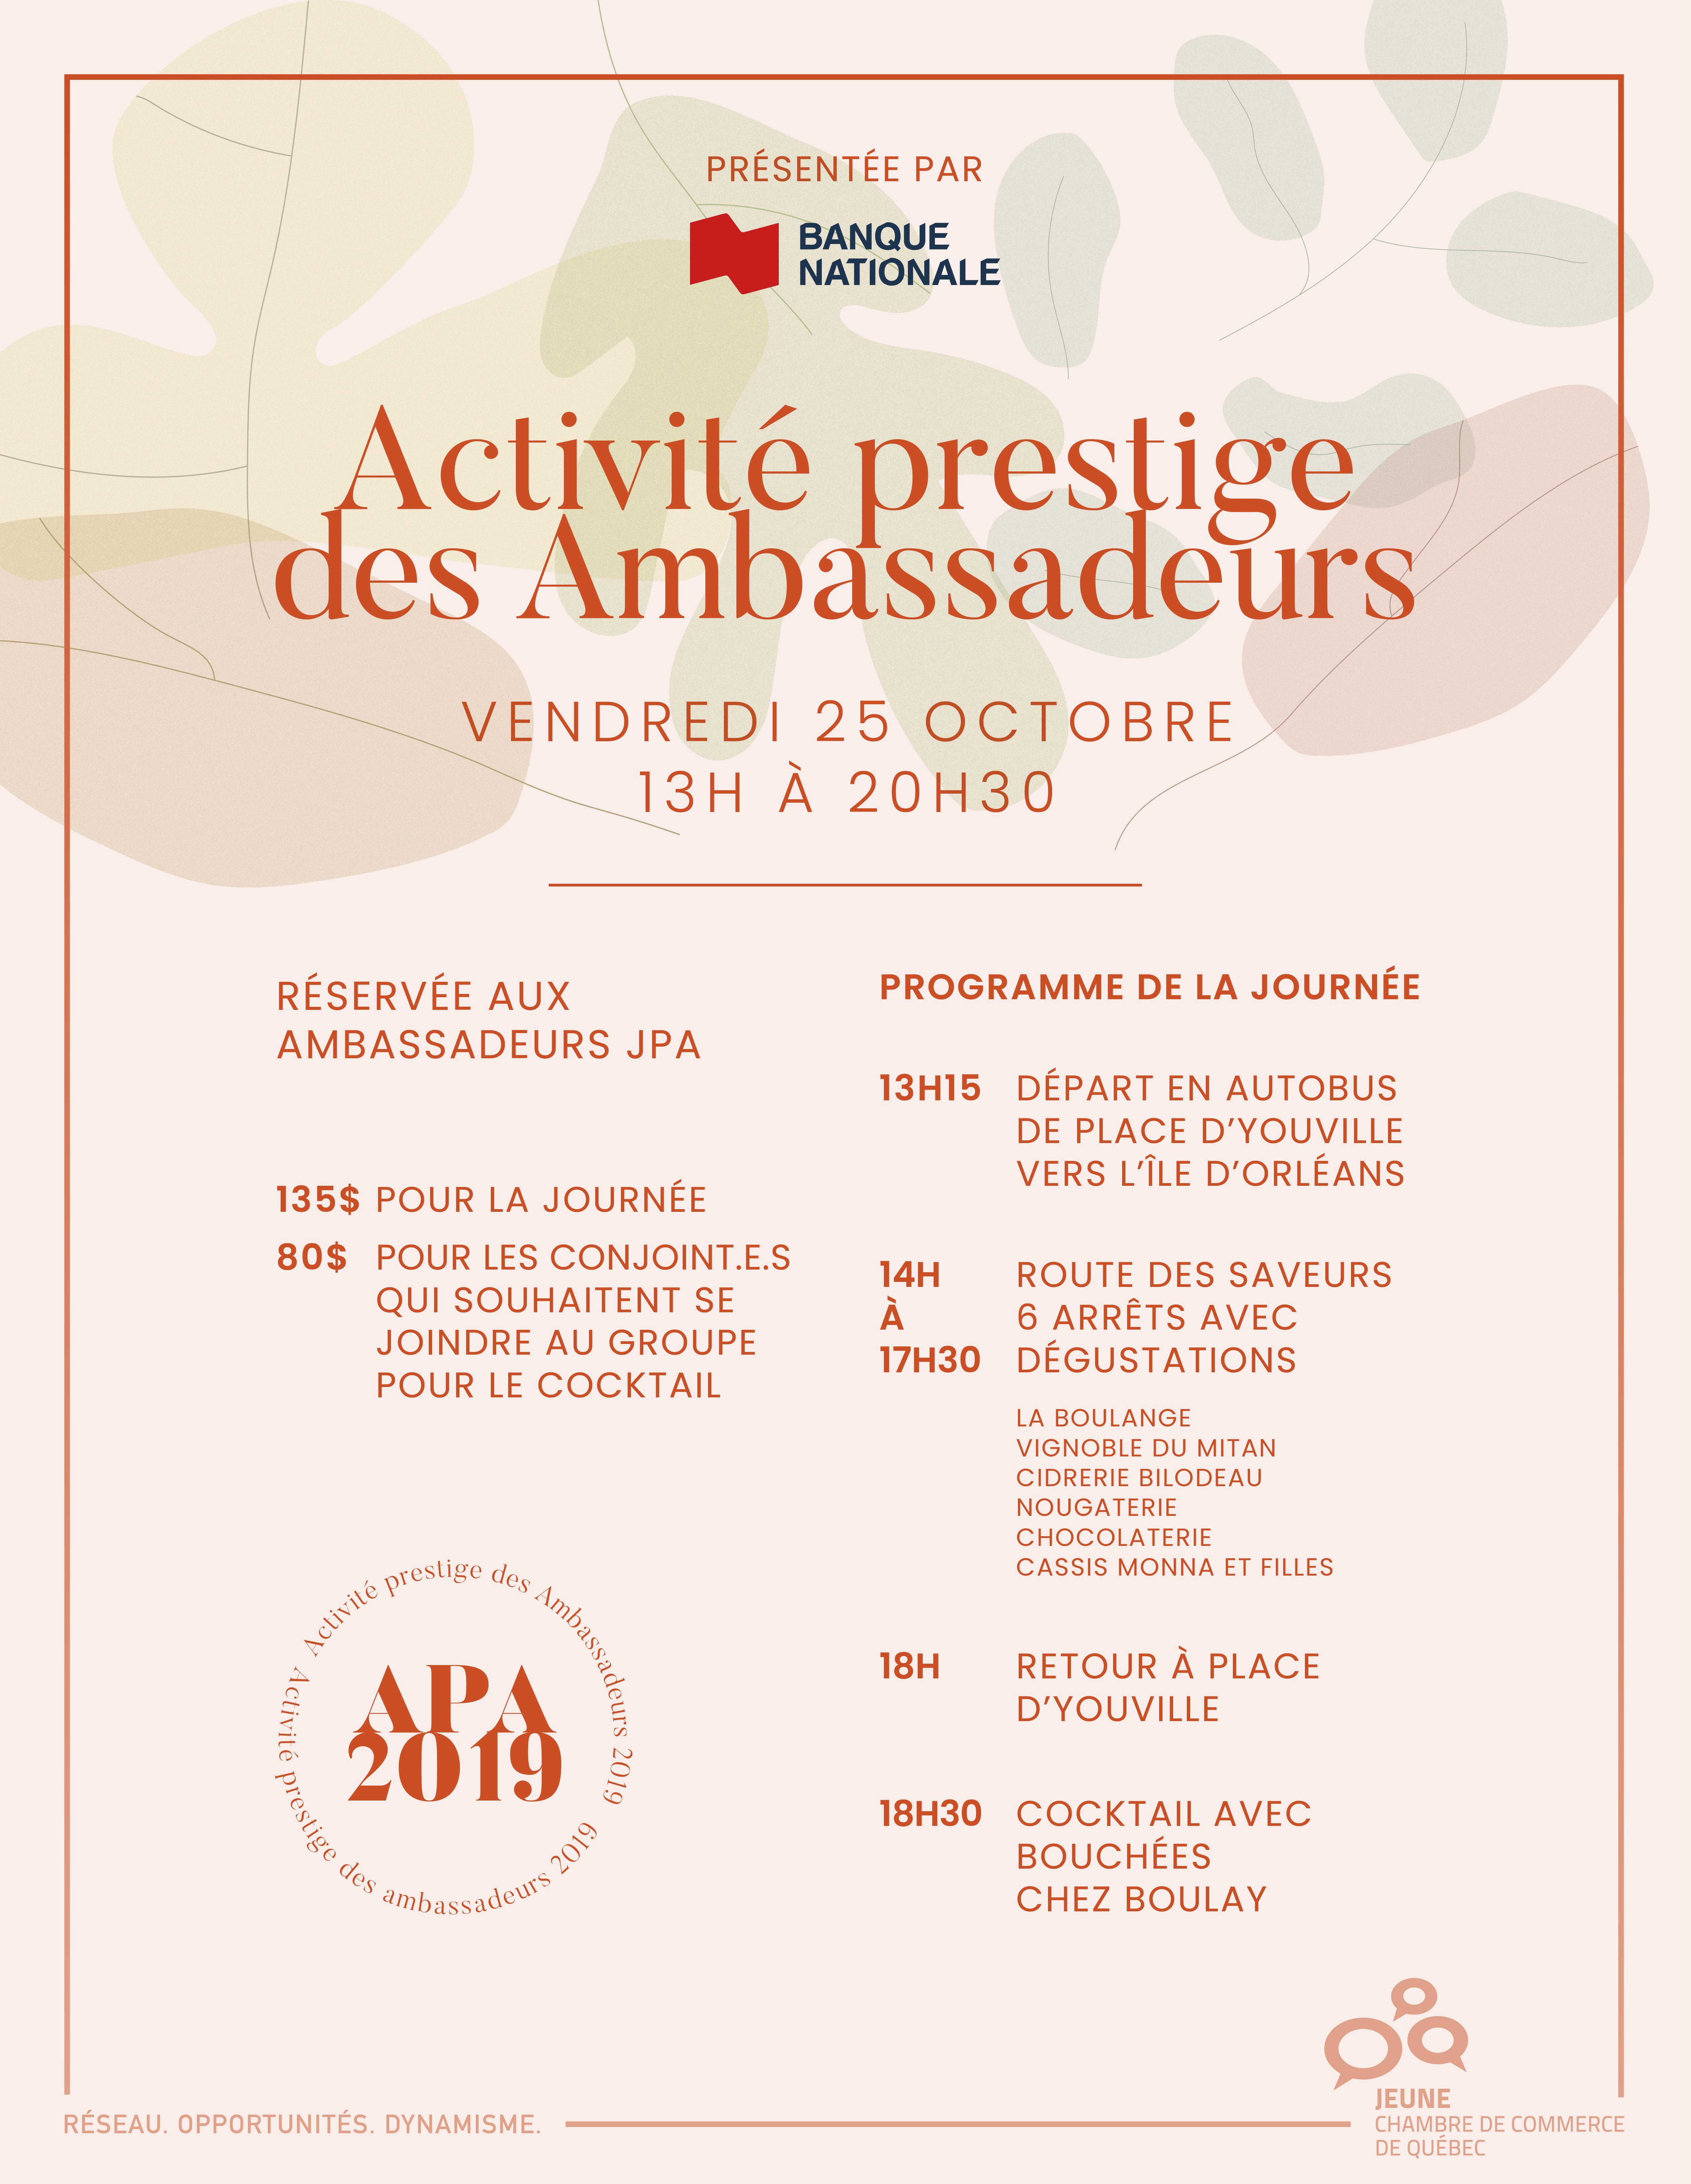 Activité prestige des Ambassadeurs